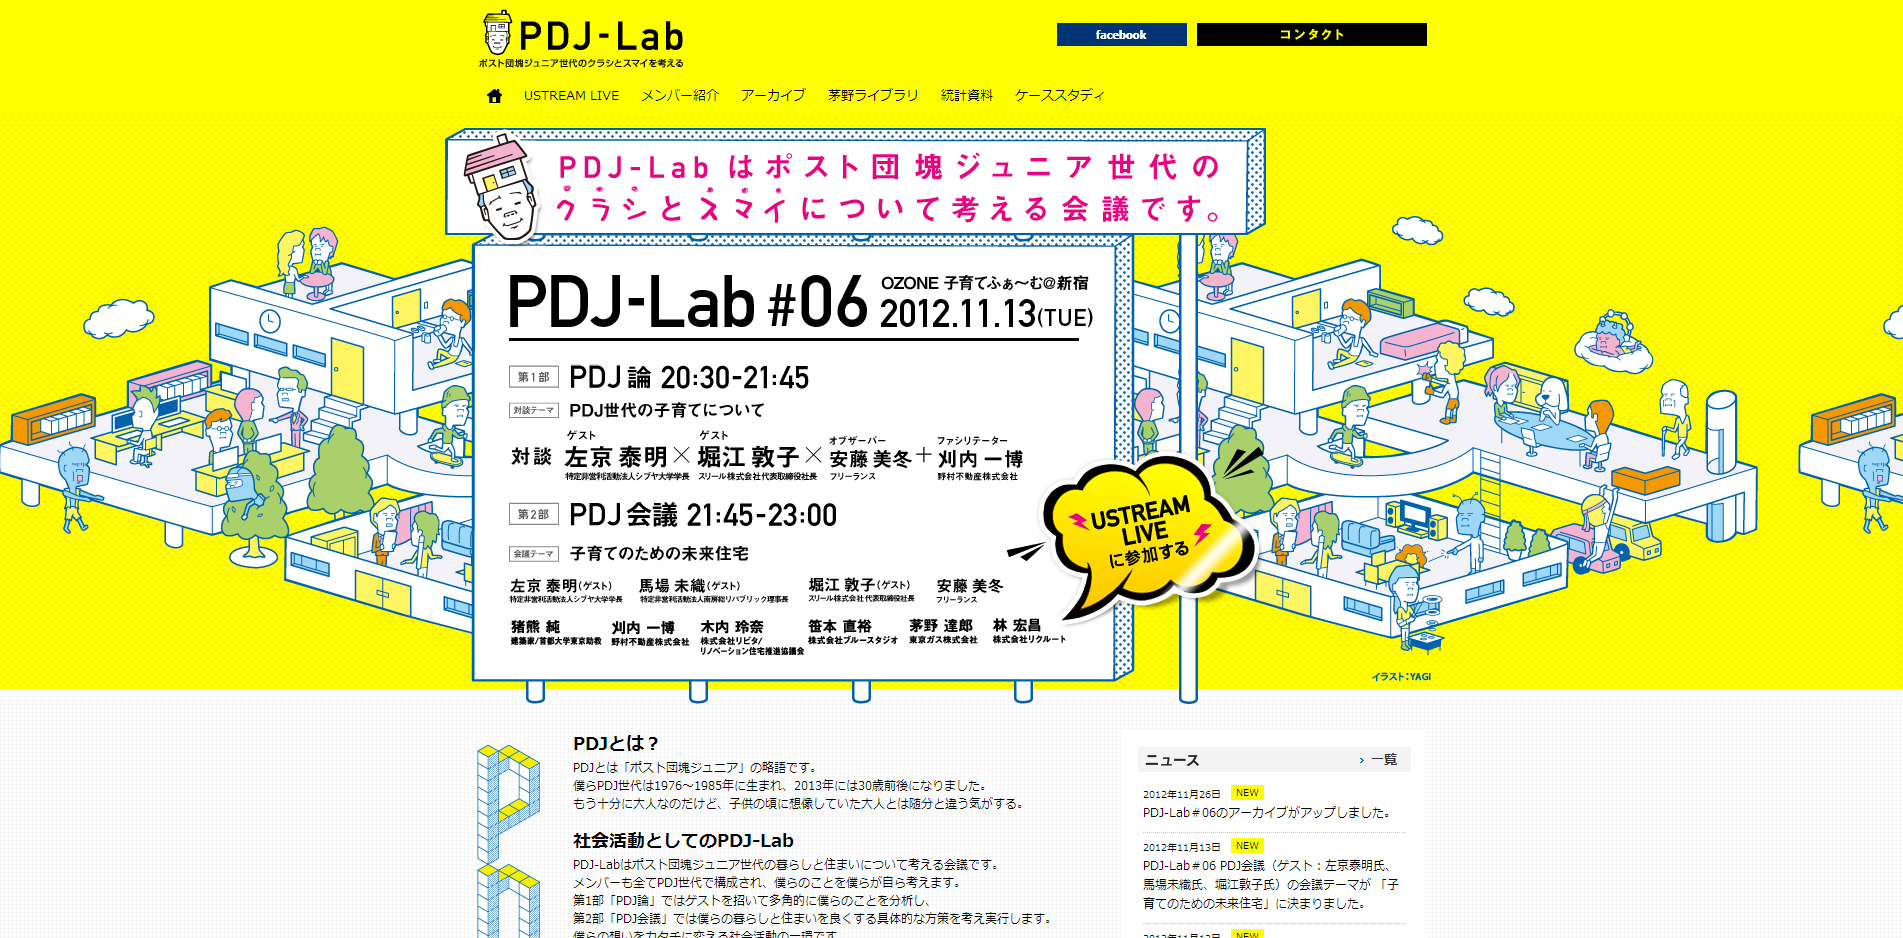 PDJ Lab ポスト団塊ジュニア プロジェクト(PDJラボ)